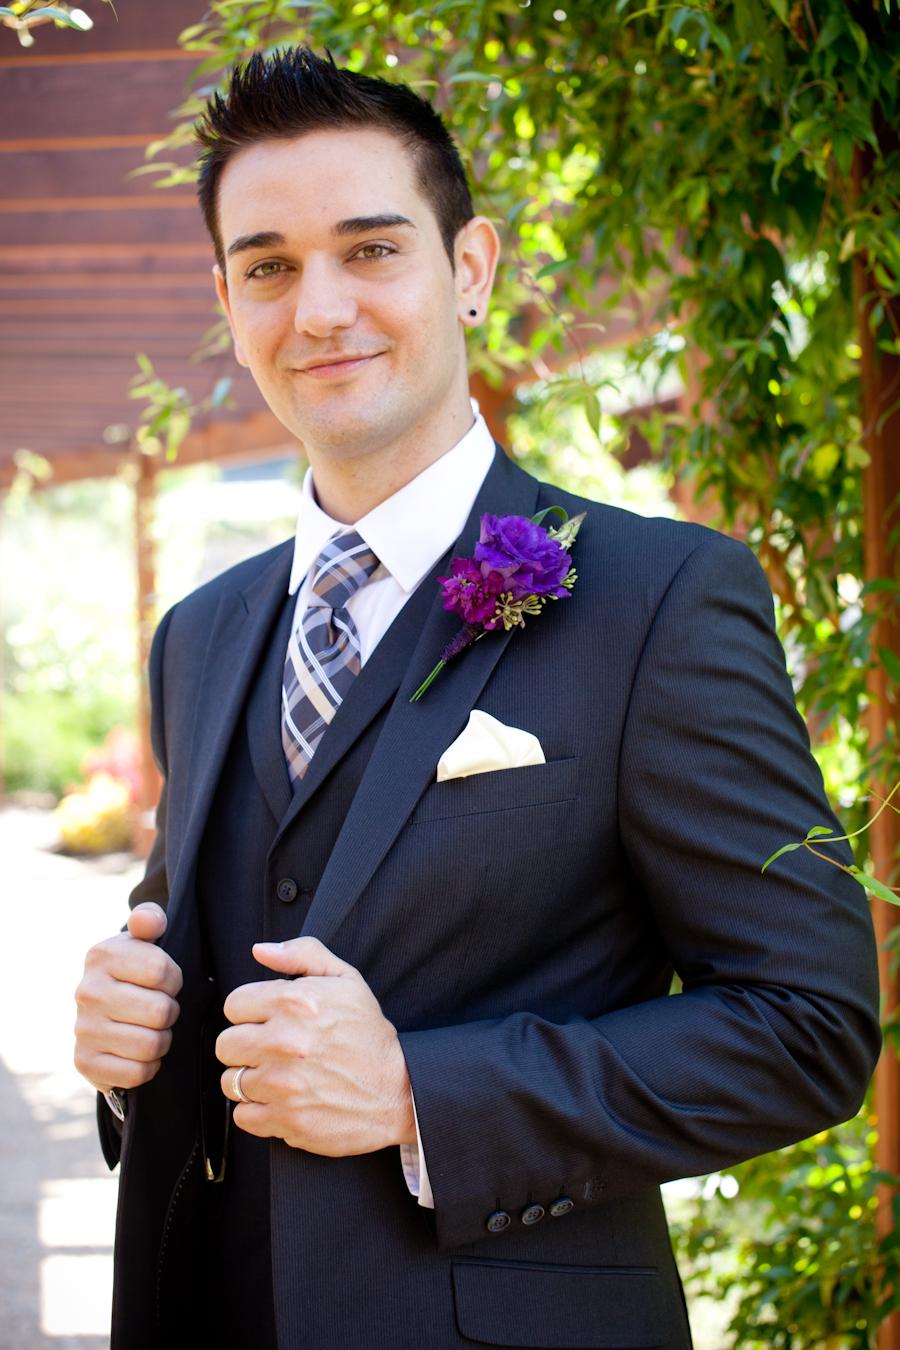 biltmore wedding asheville nc-11.jpg